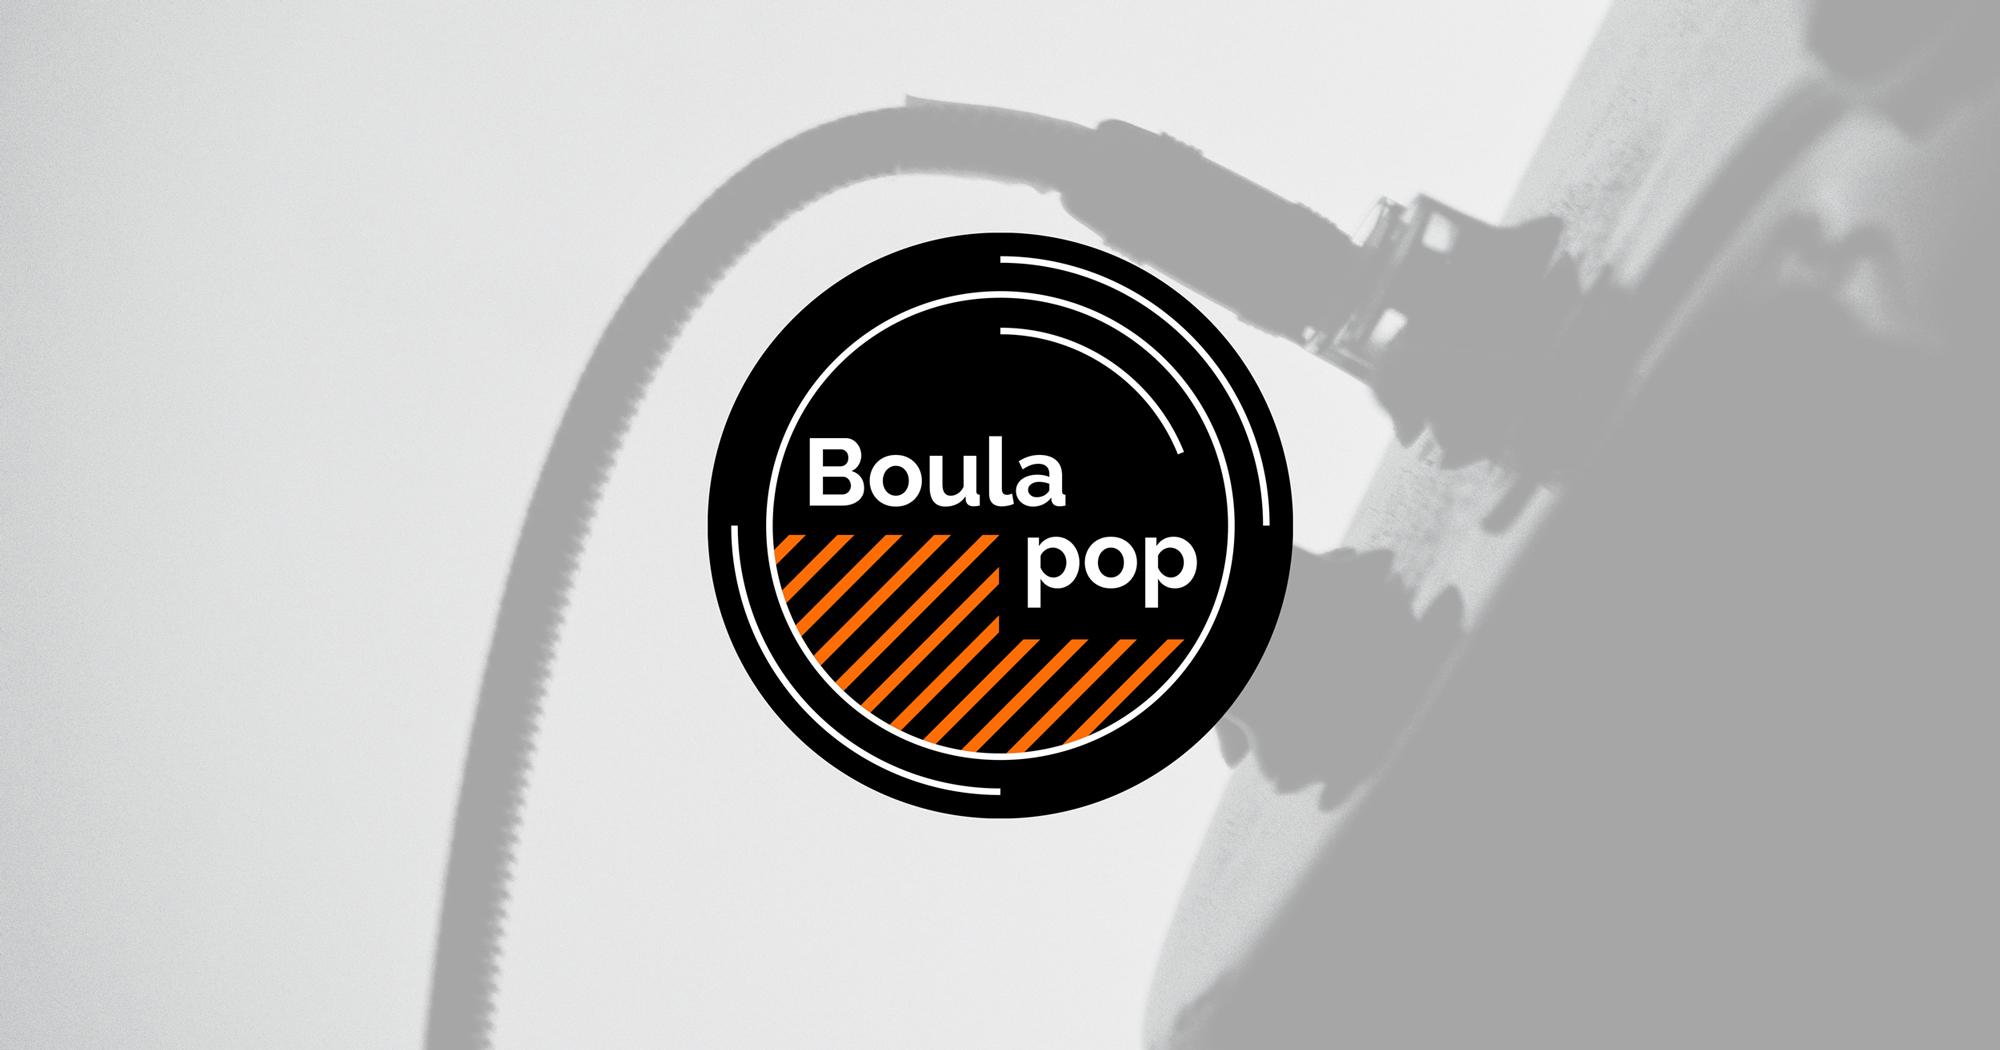 Ecran logo Boula pop